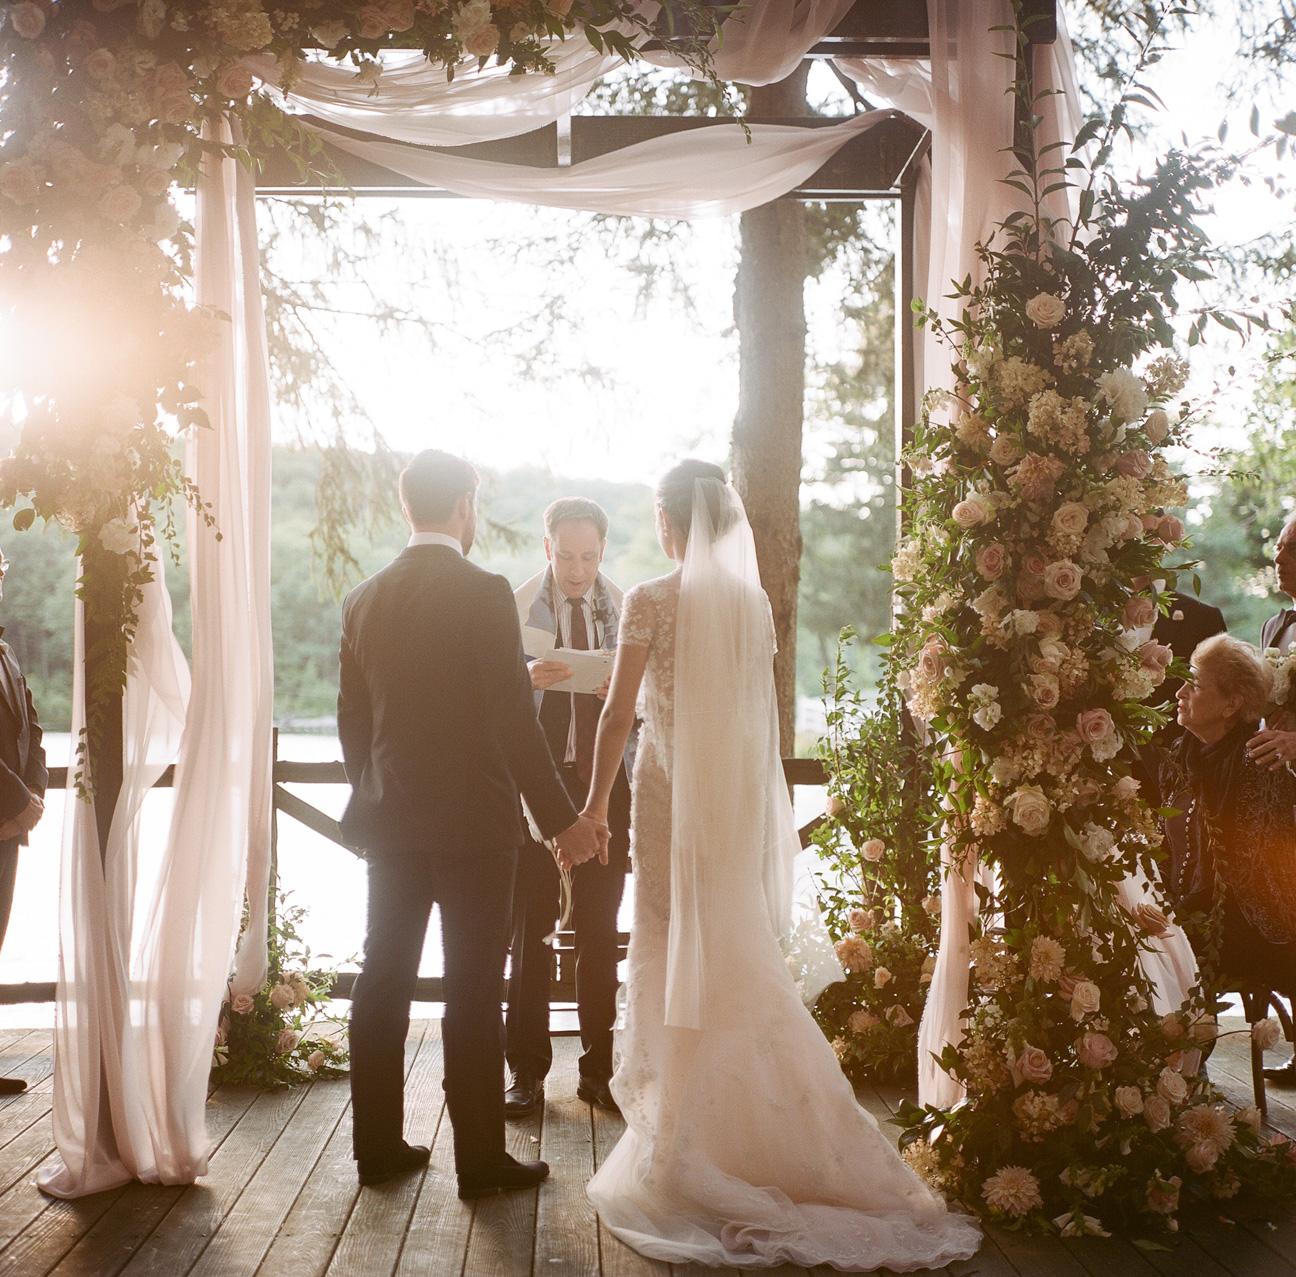 KarenHillPhotography-Parizat-Wedding-0590.jpg